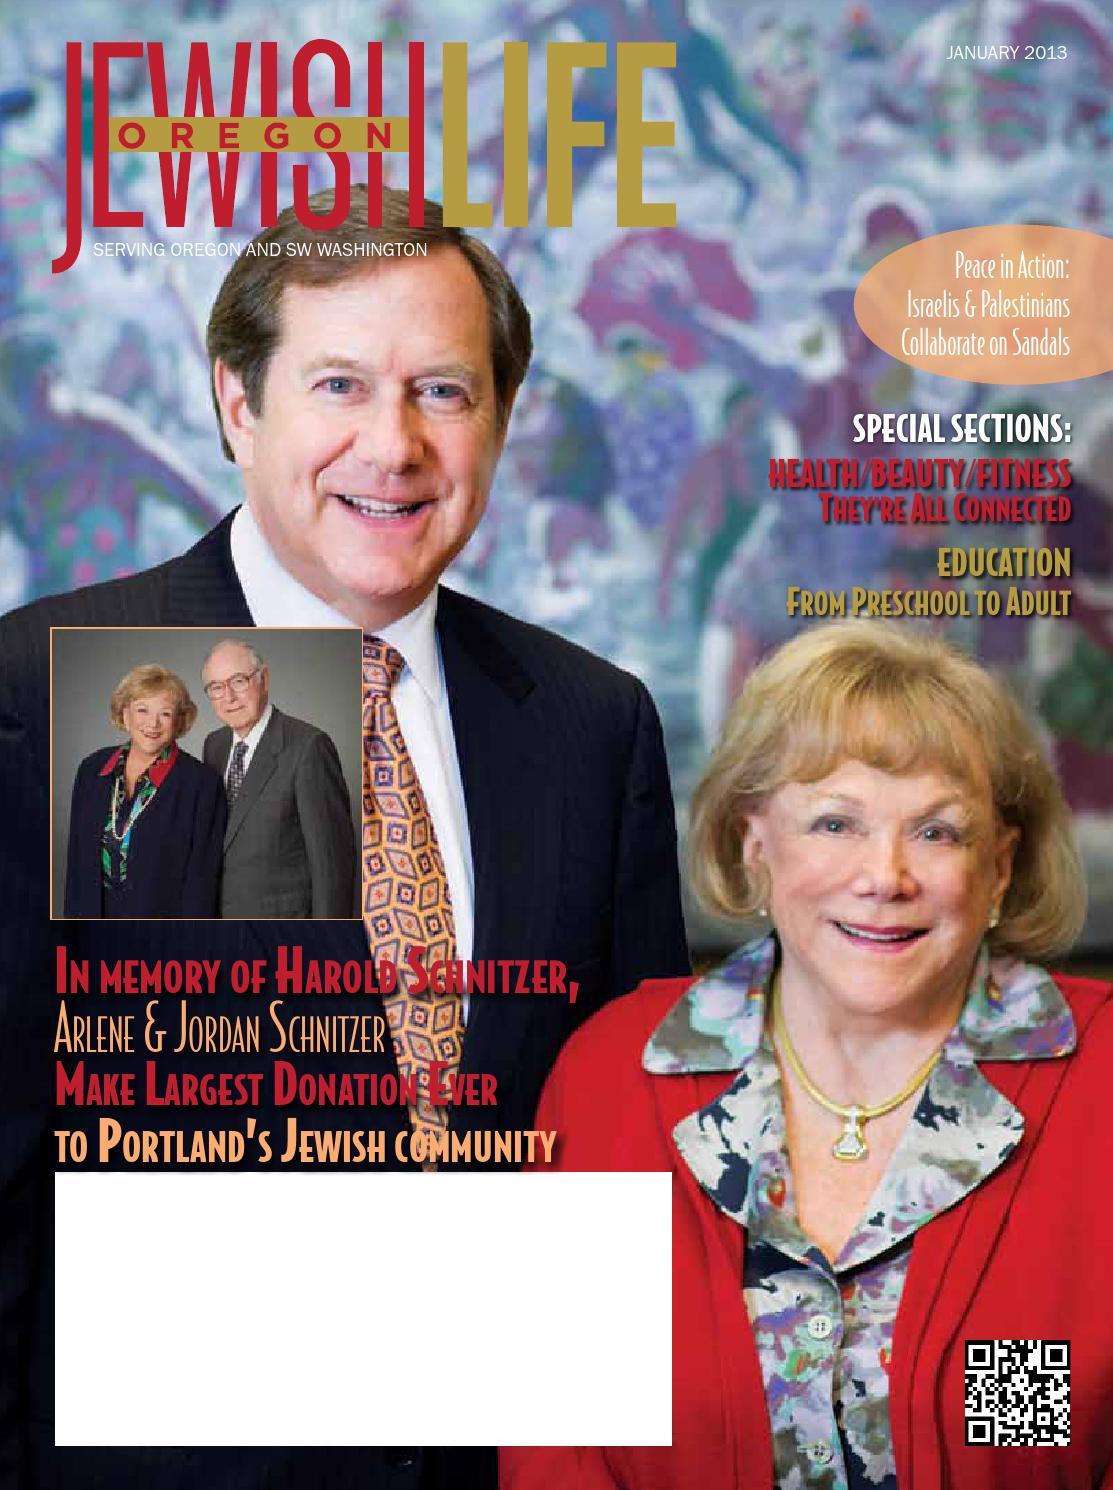 9836fcc26195d Oregon Jewish Living Vol.1 Issue 12 by JewishLifeMagazine - issuu